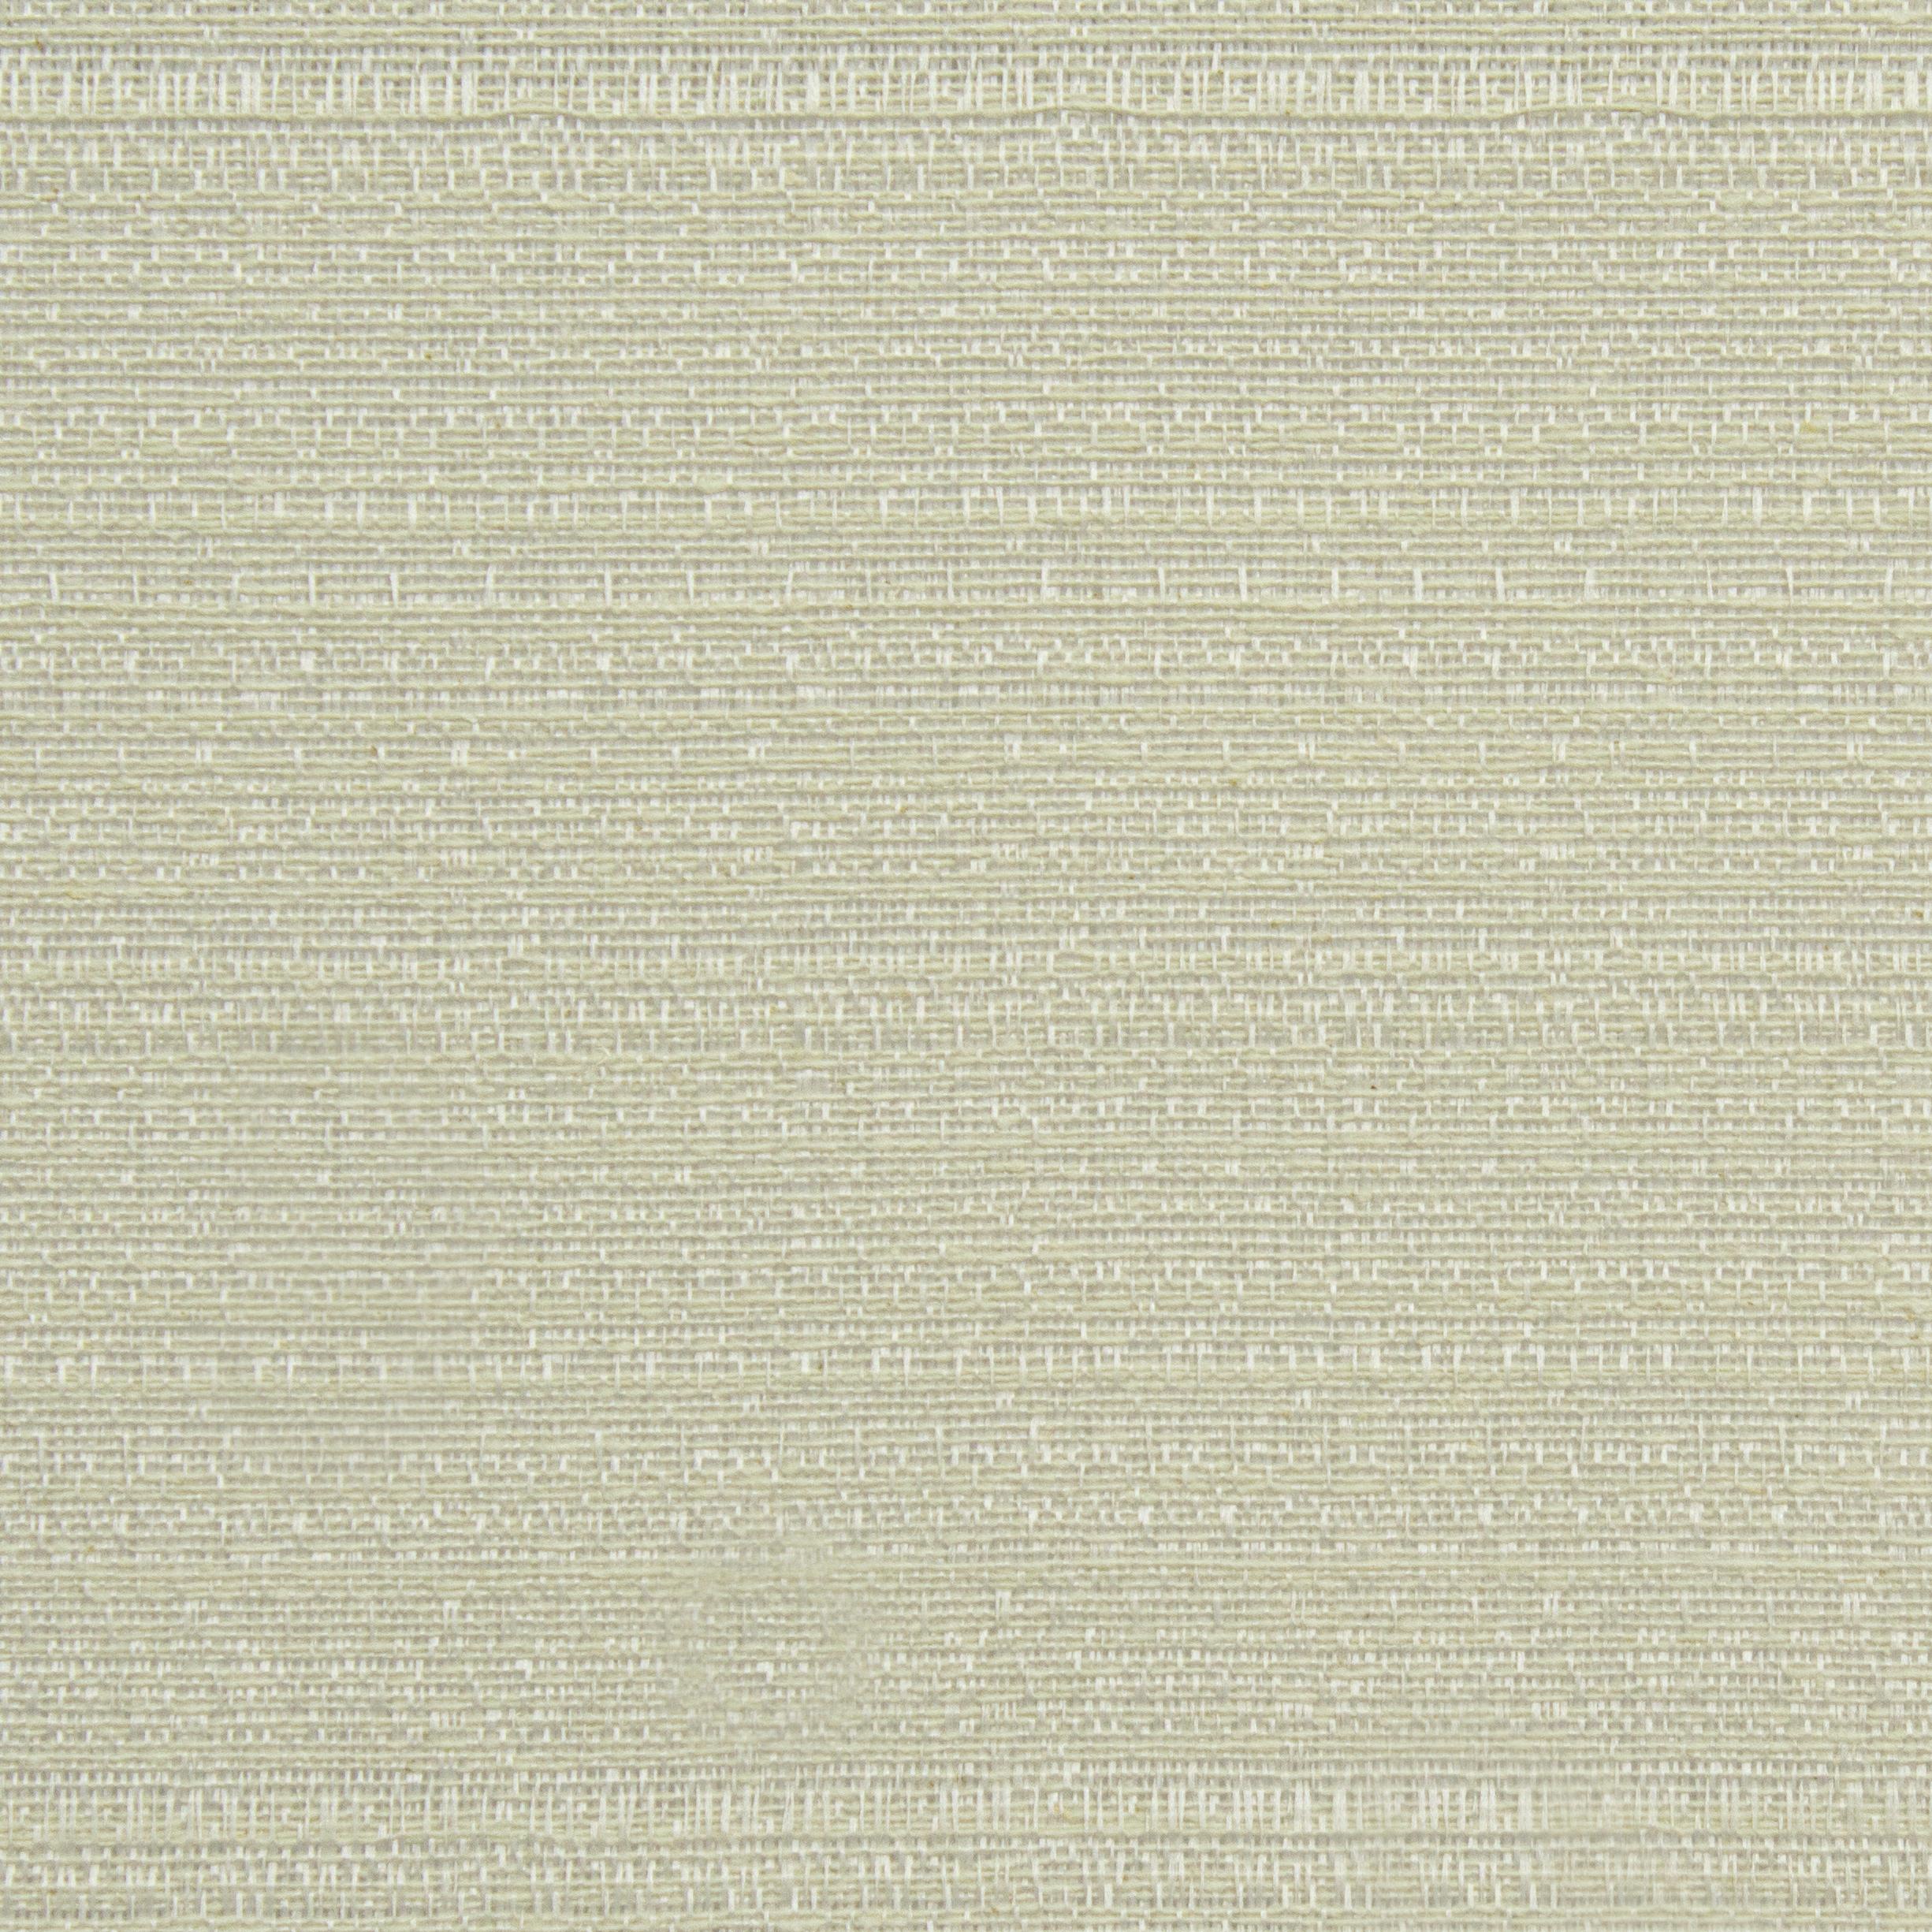 4313 Ivory